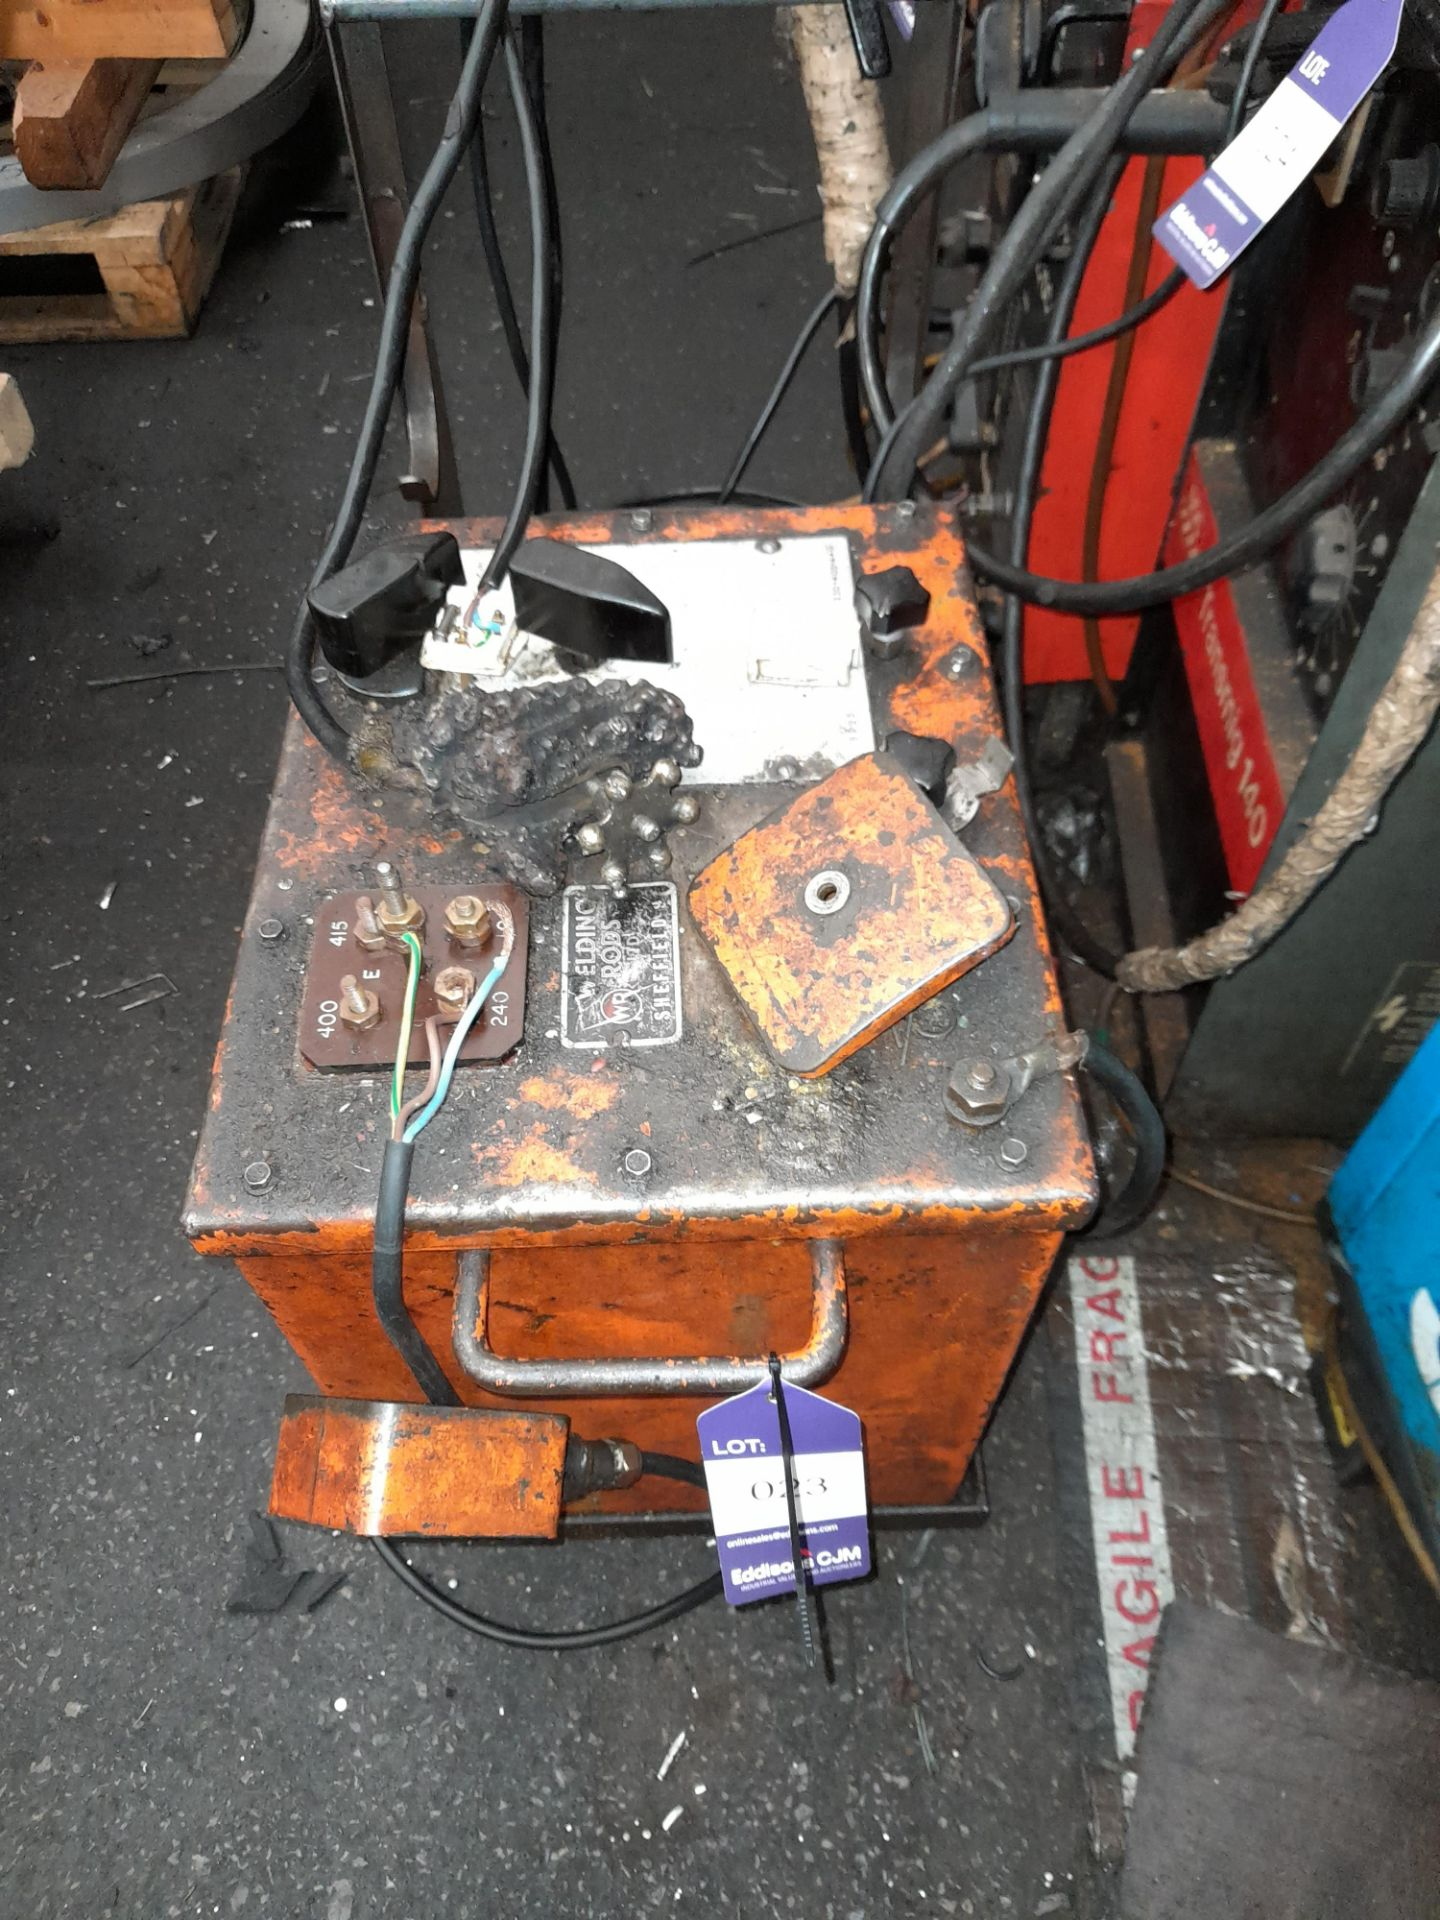 Welding Rods Limited, Oil Filled Arc Welding Set